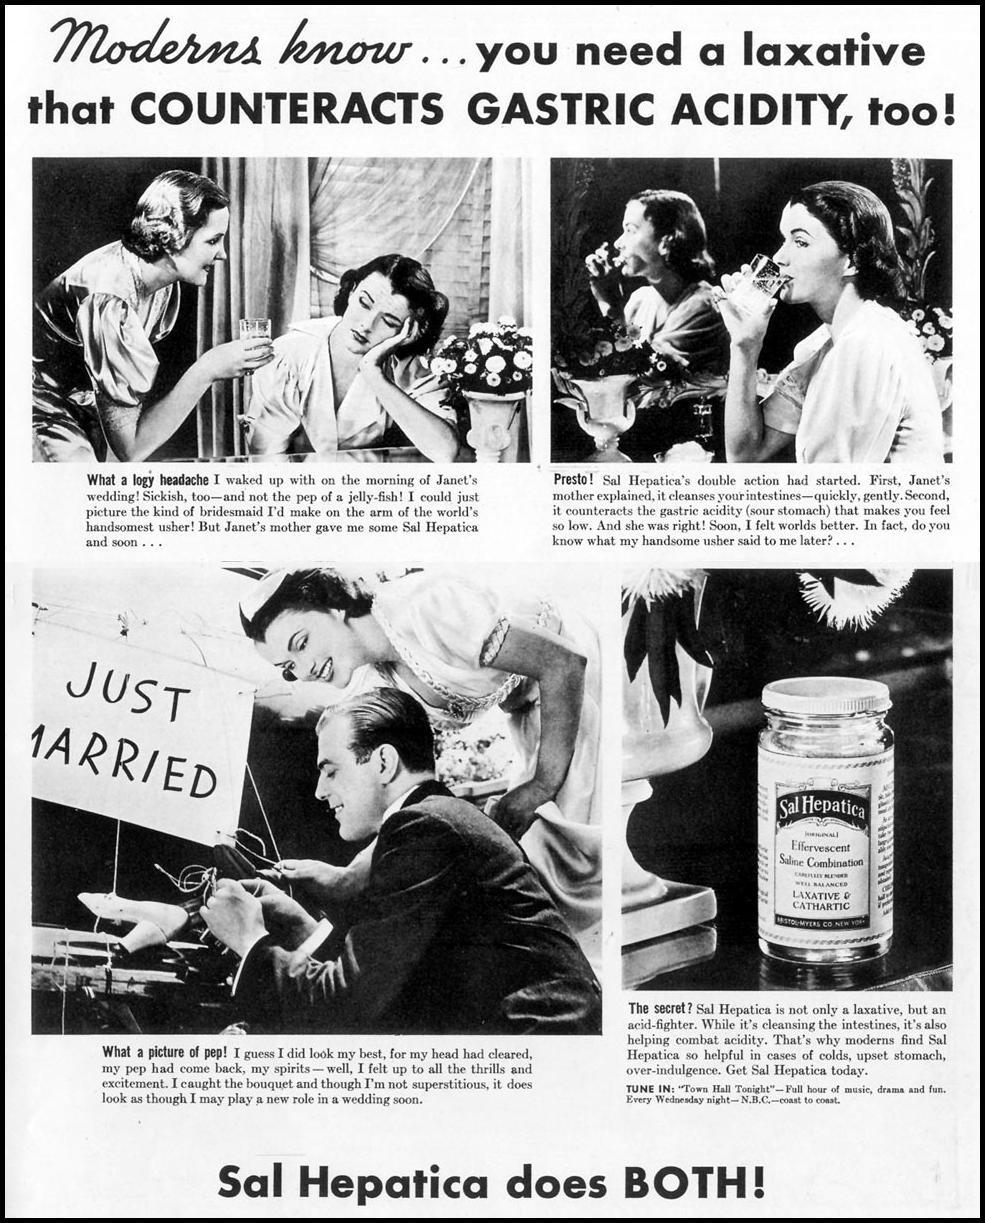 SAL HEPATICA LAXATIVE LIFE 09/20/1937 p. 1